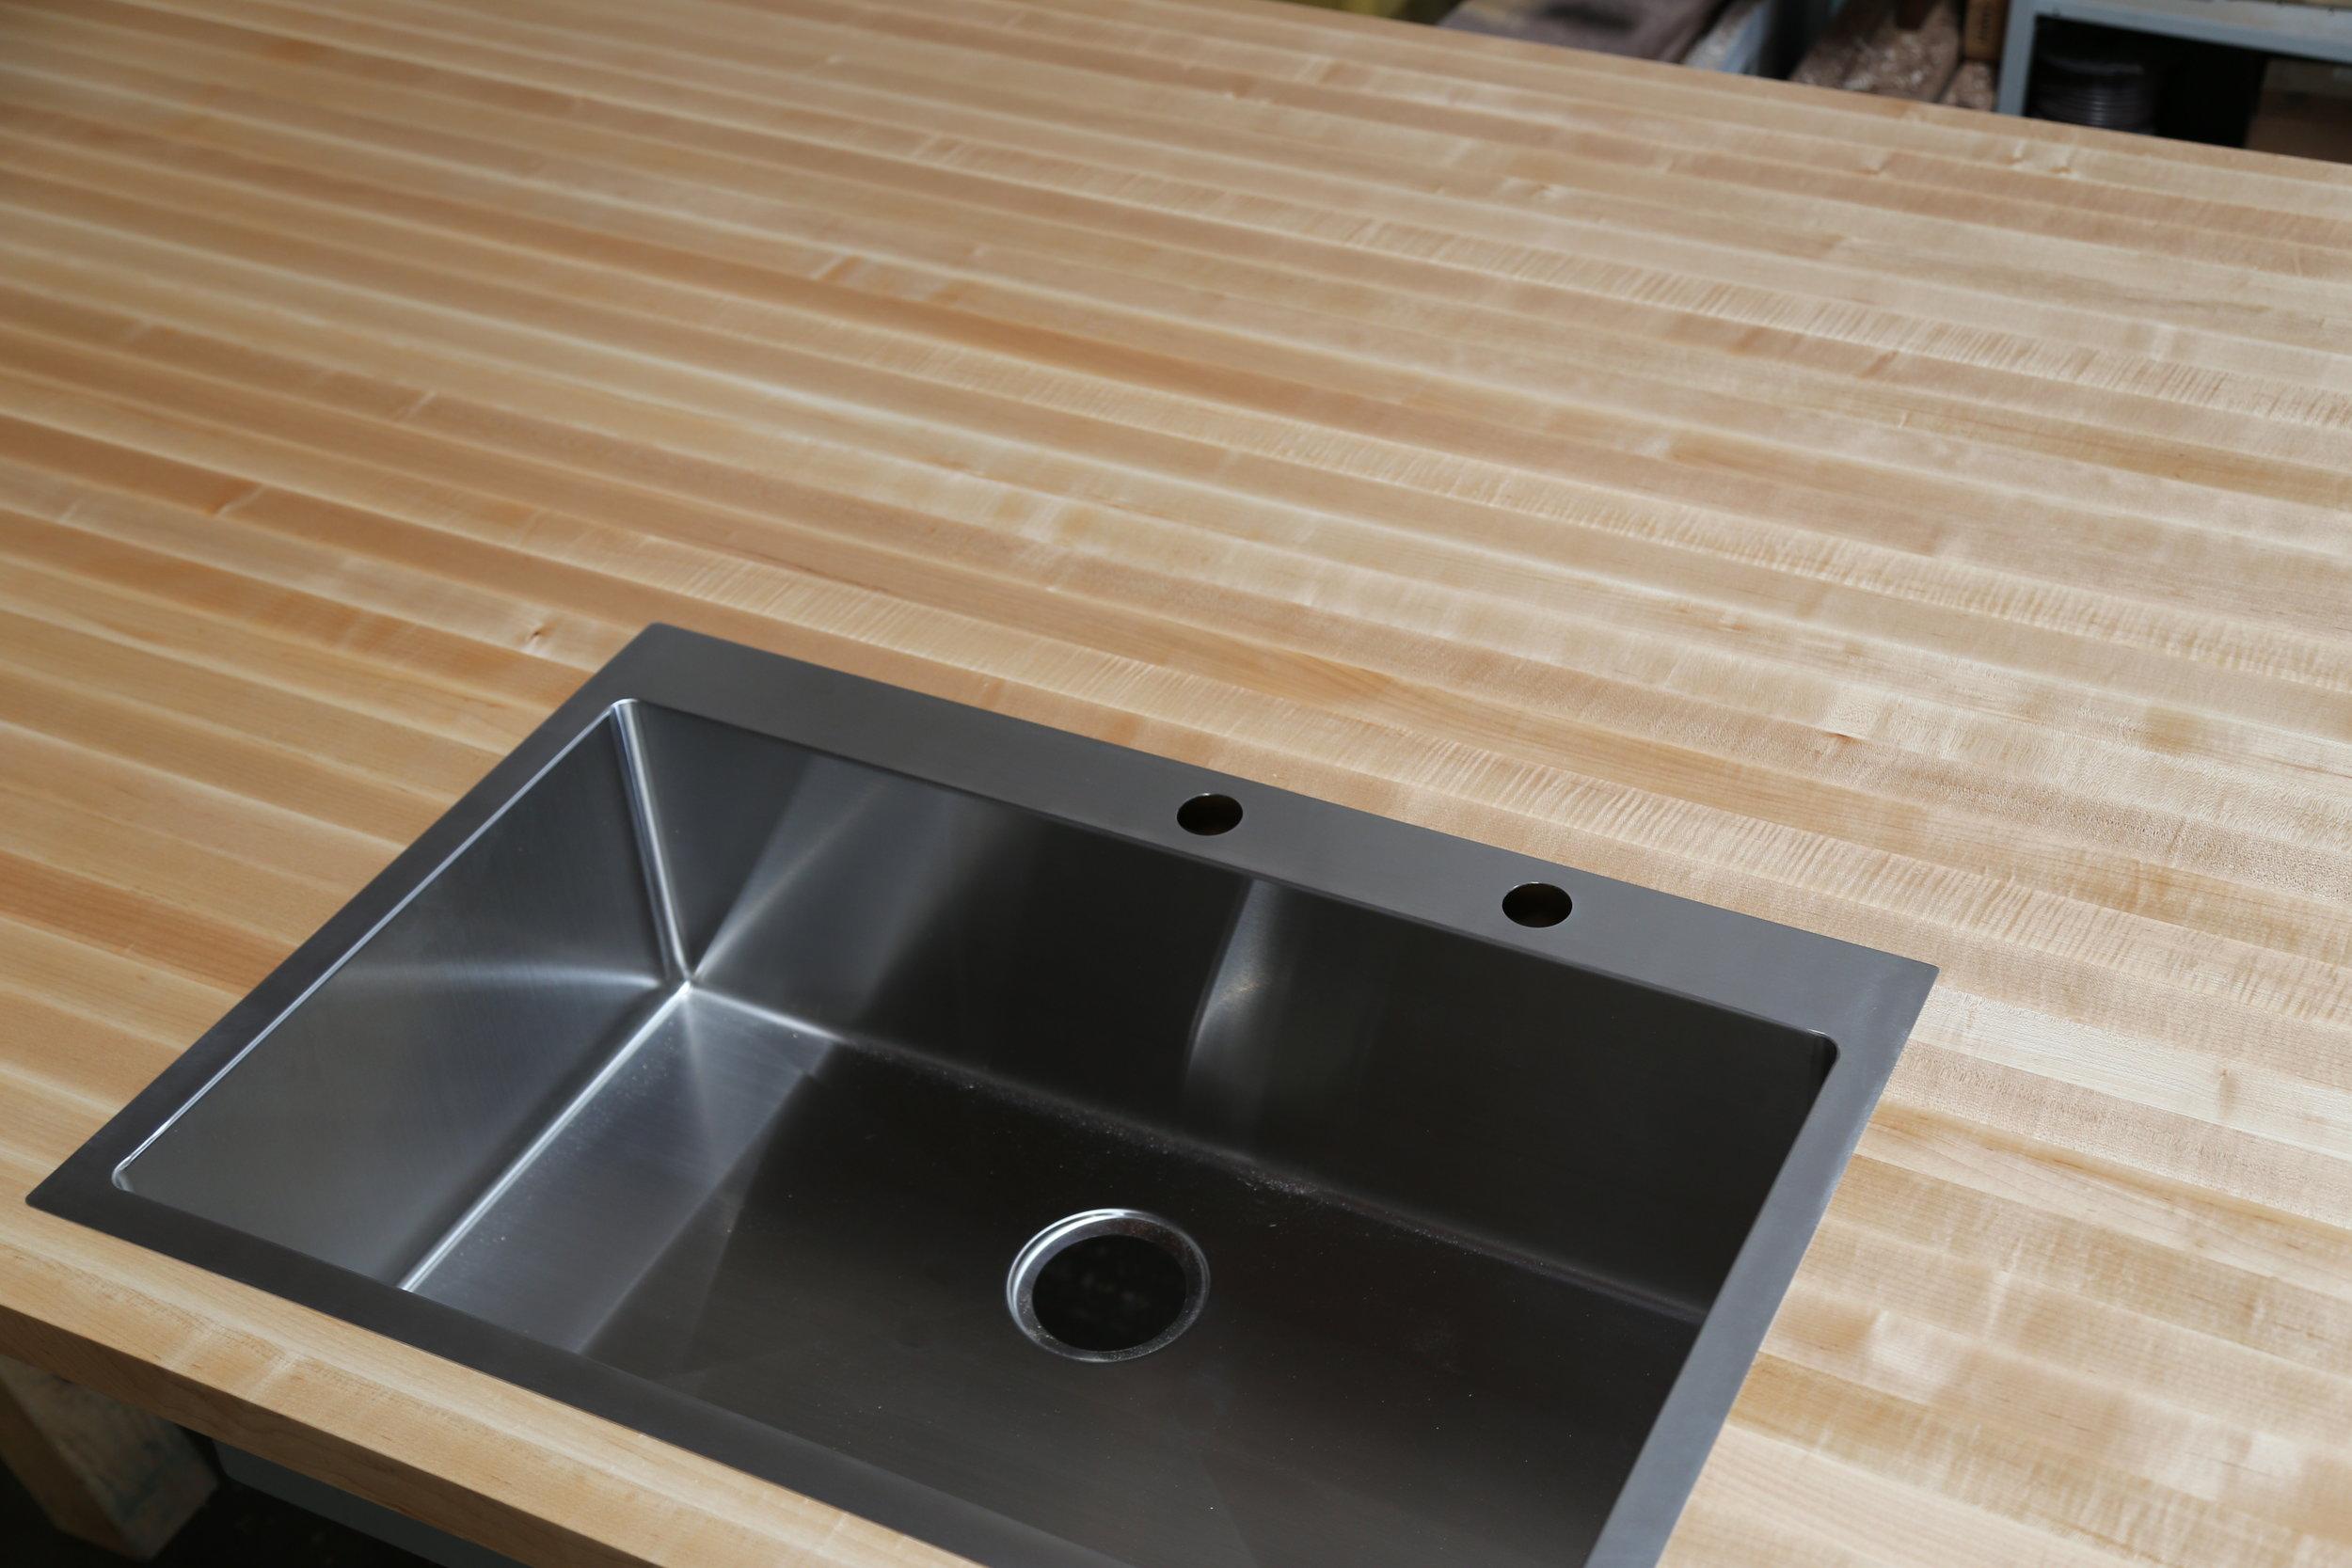 Maple Edge Grain with Sink Cutout